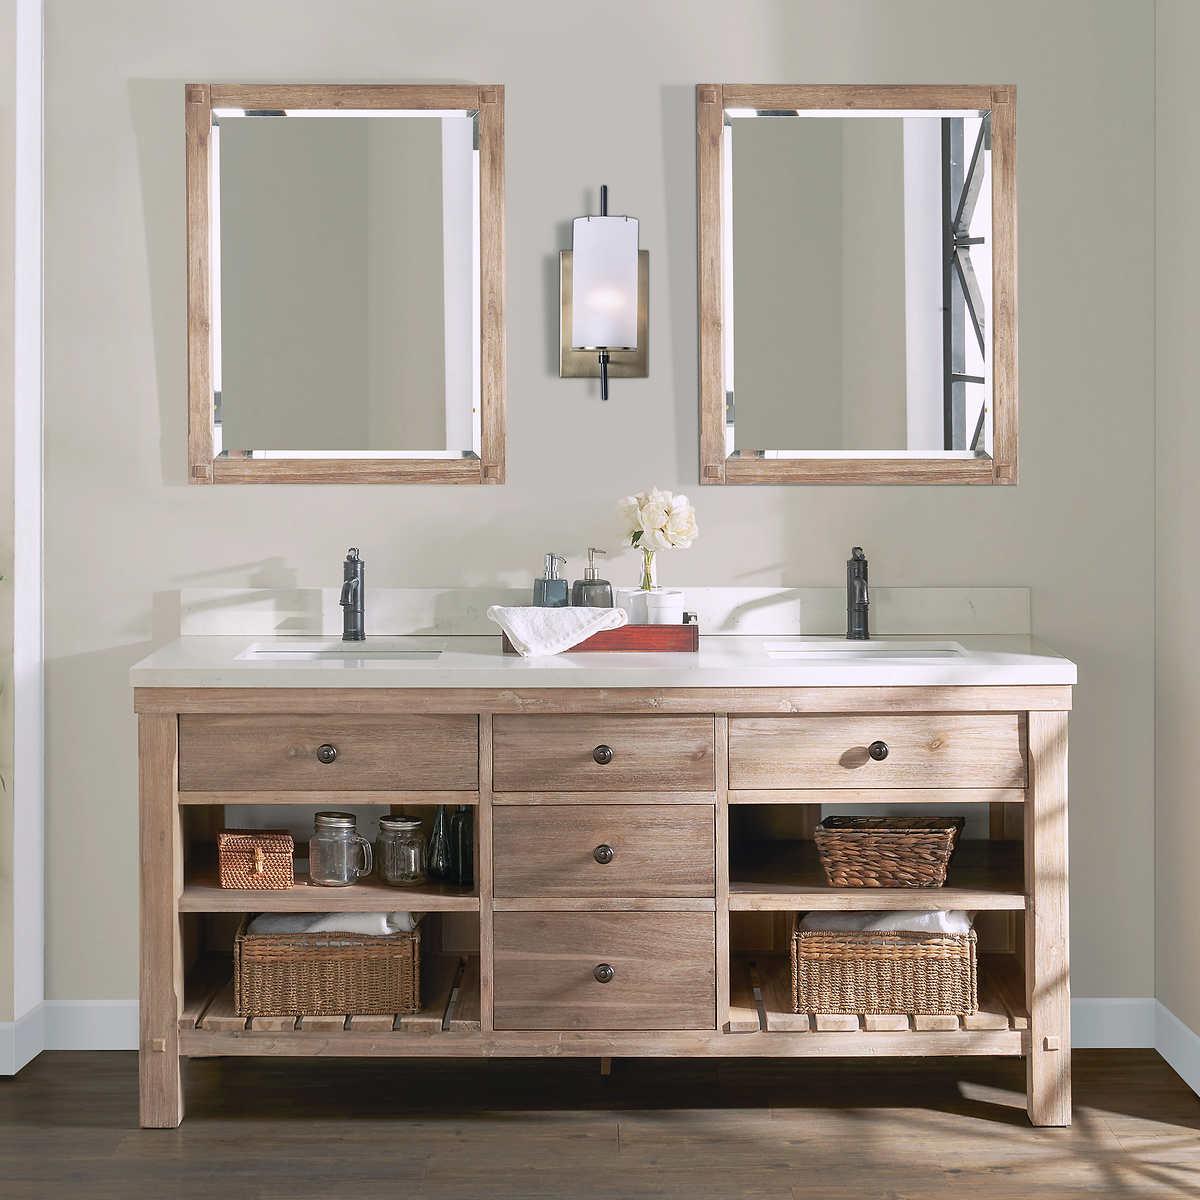 Northridge Home Elbe Rustic 12 in. Double Bathroom Vanity